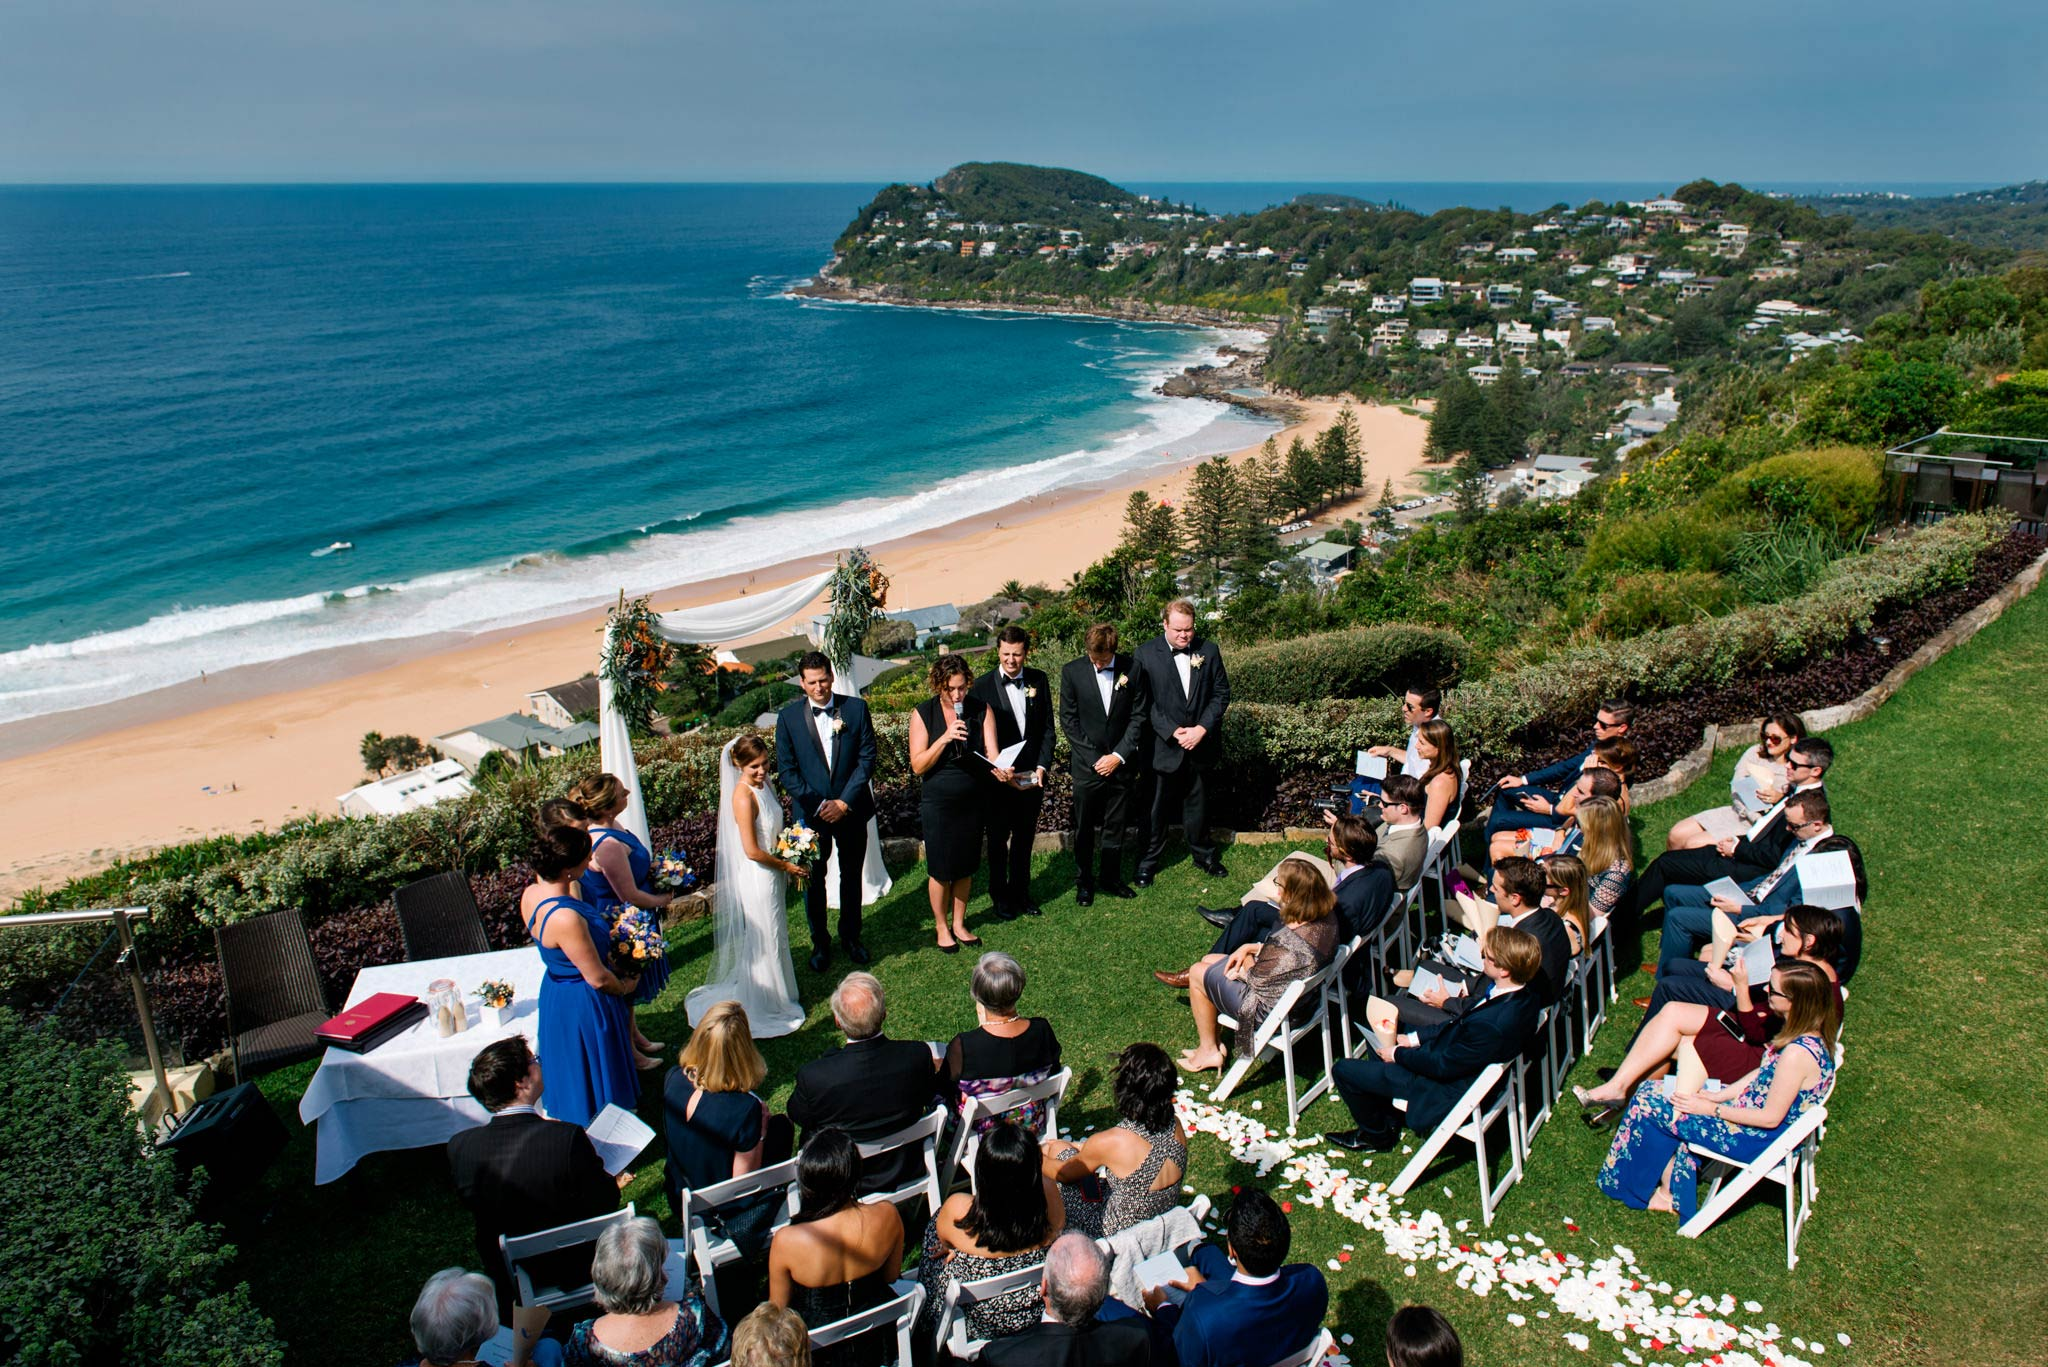 Wedding ceremony at Jonah's Whale Beach